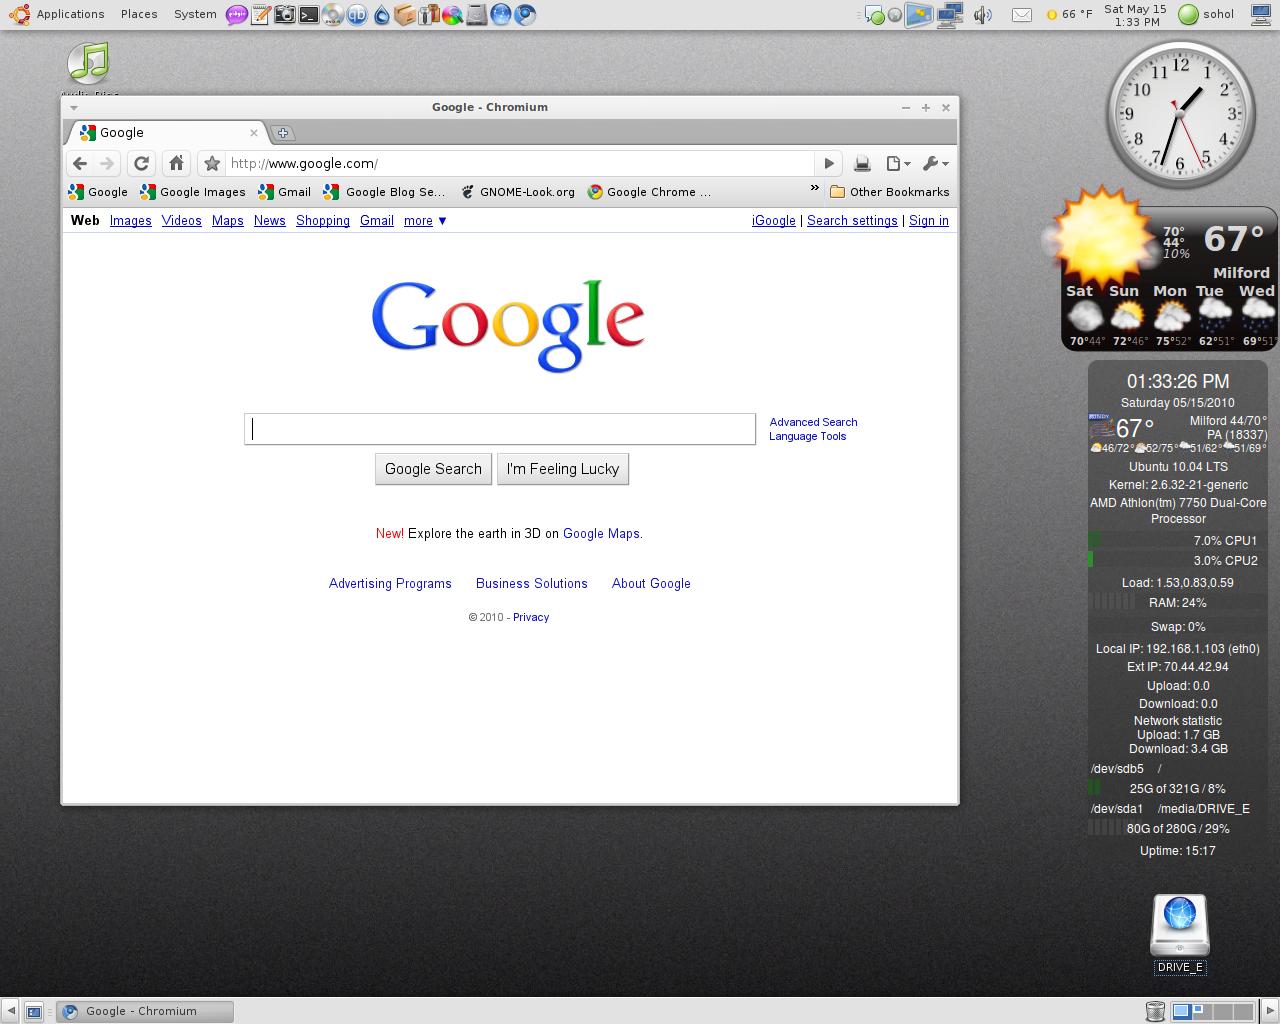 My World Thru A Web Browser: May 2010